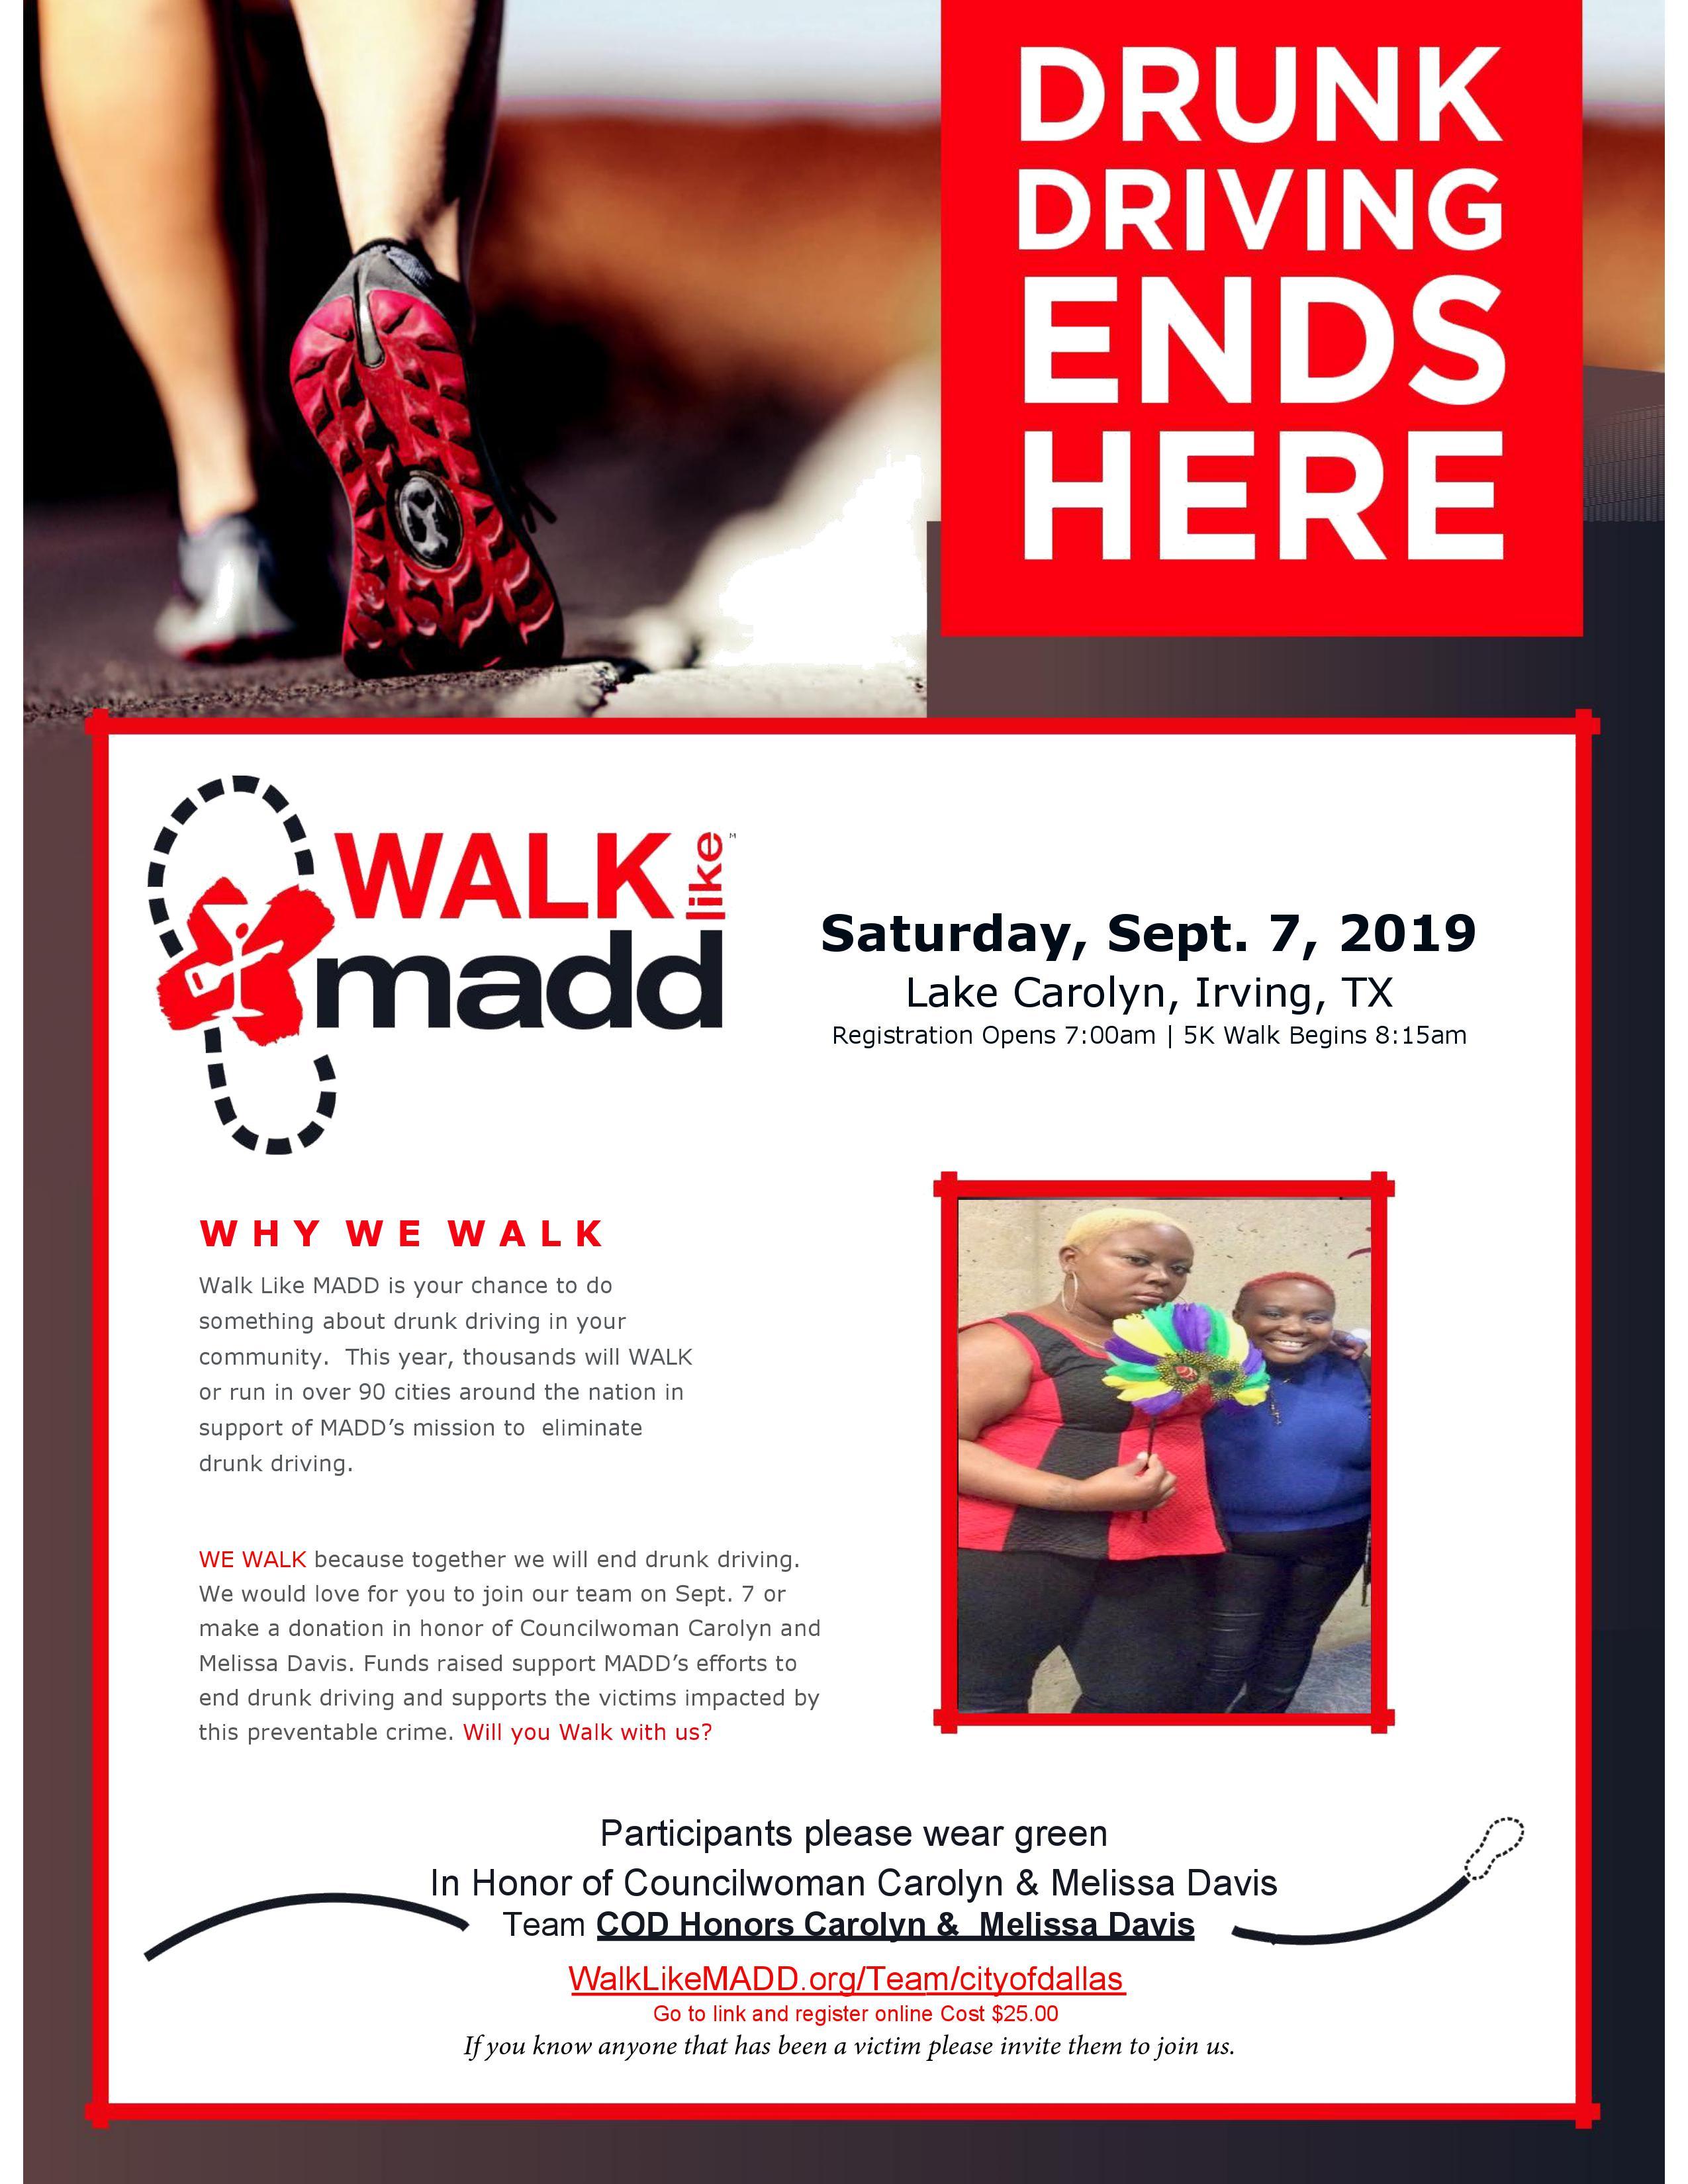 Walk Like MADD @ Lake Carolyn